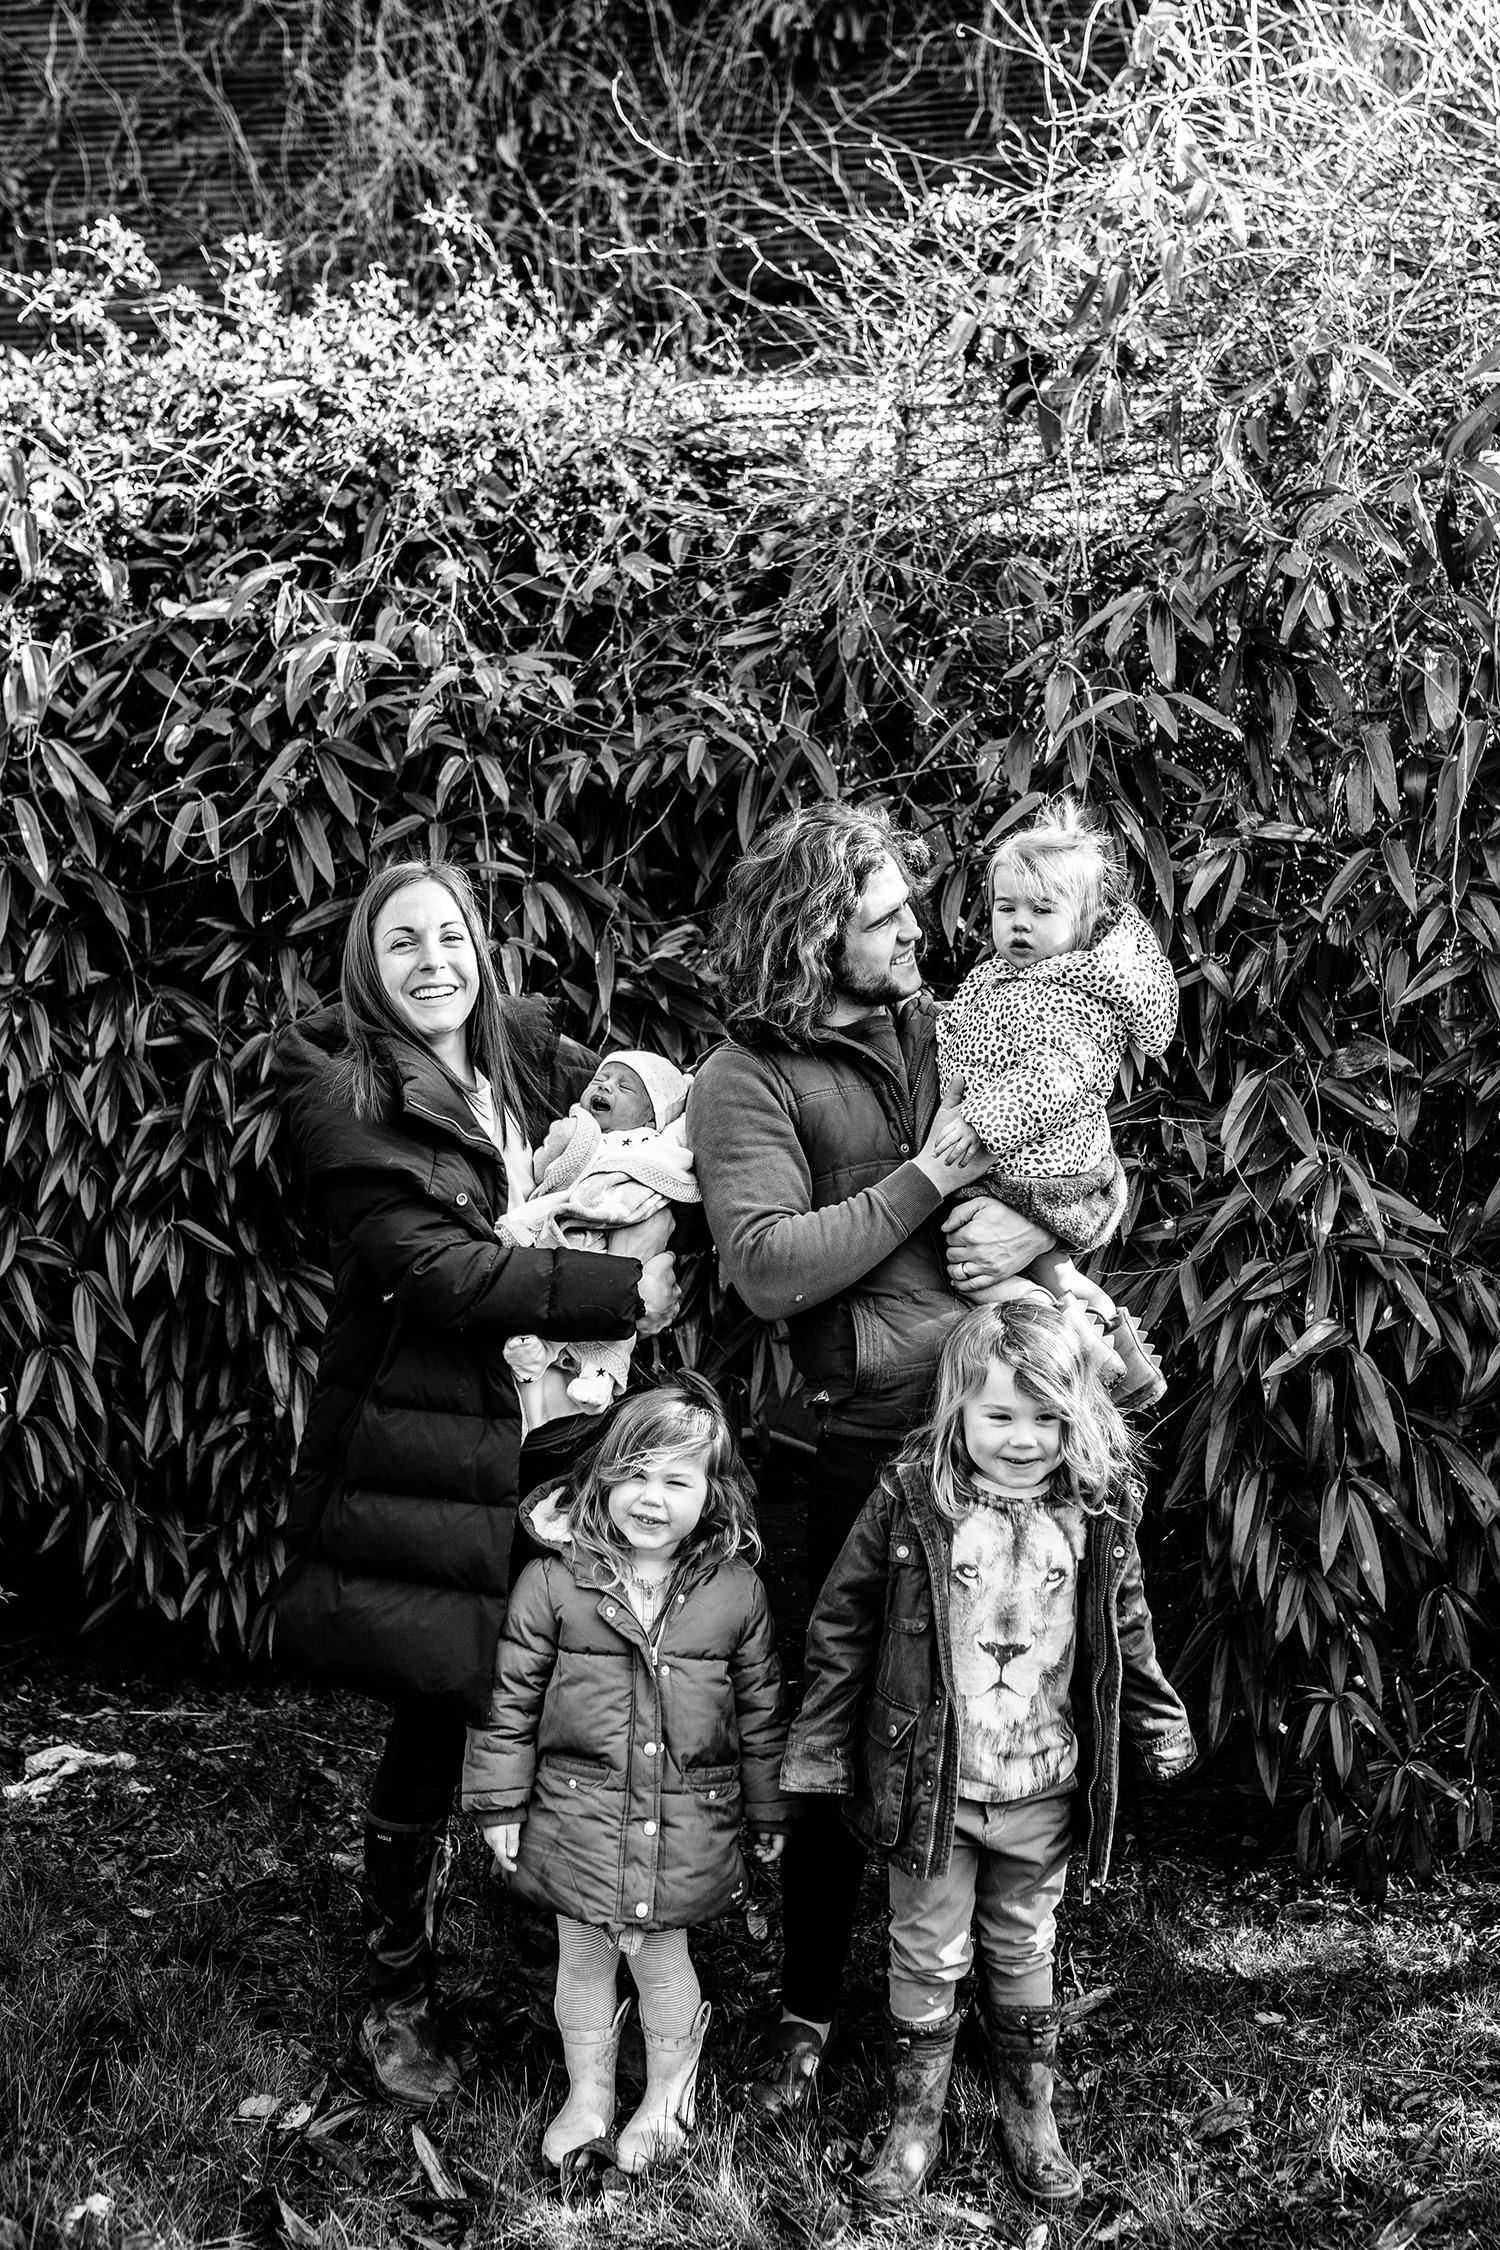 FAMILY FARM NEWBORN PHOTOGRAPHY 36.JPG